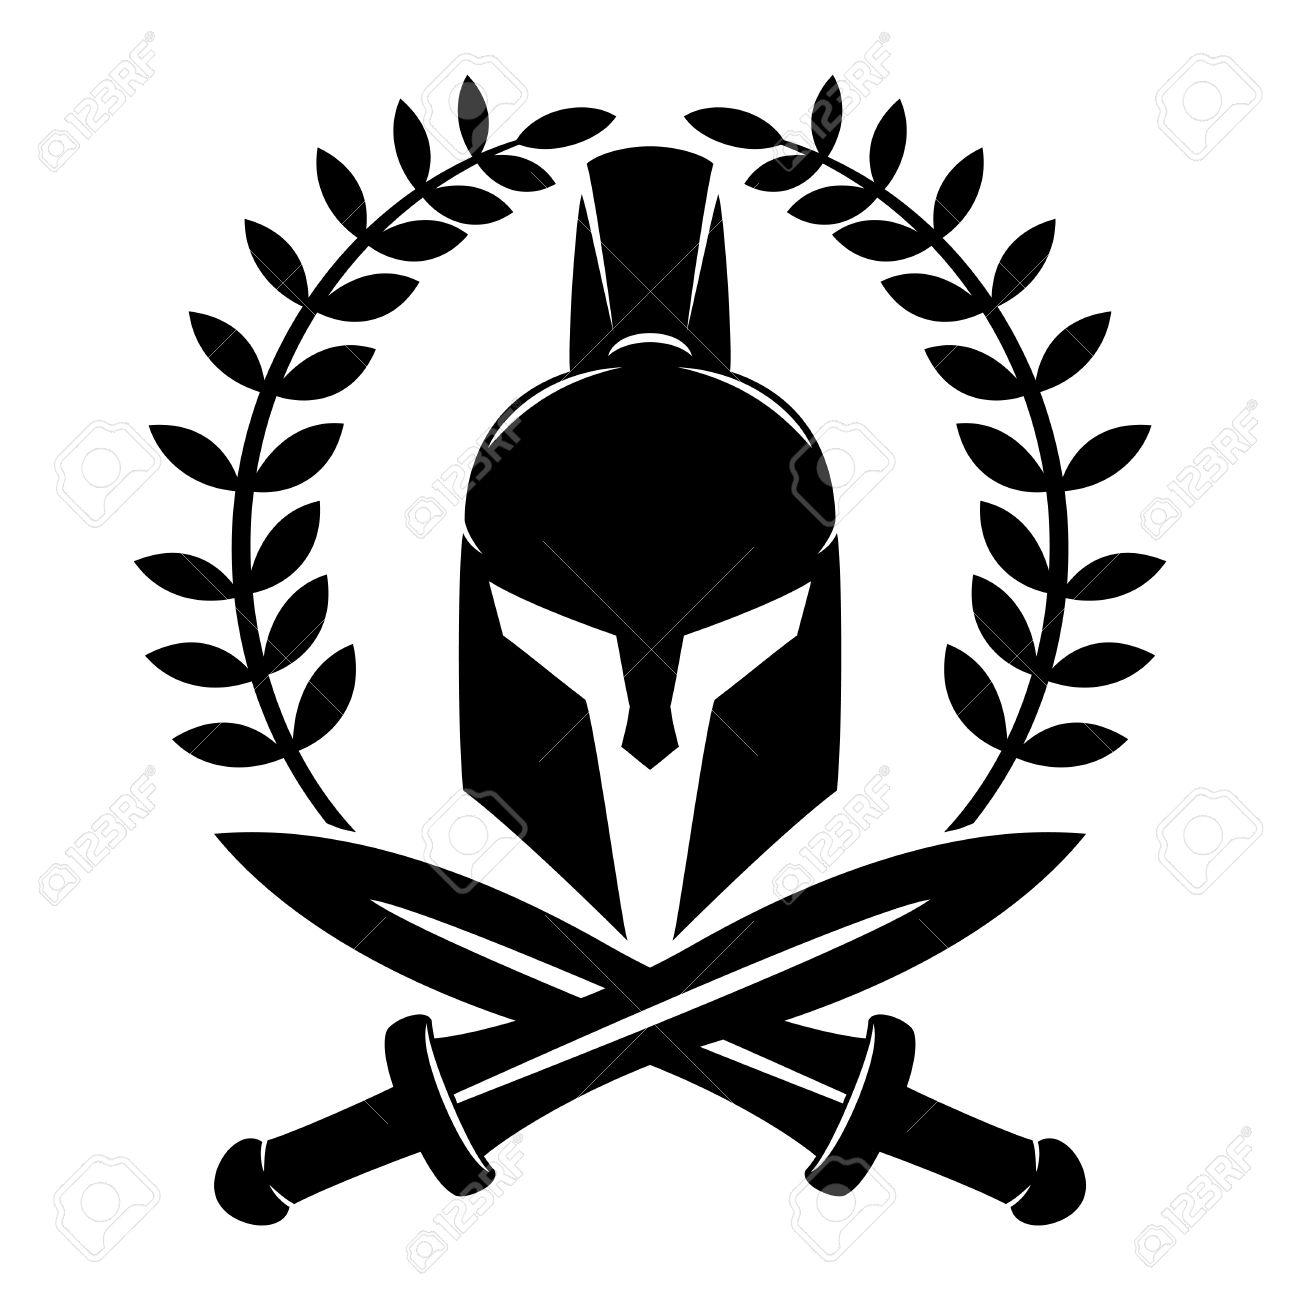 spartan helmet royalty free cliparts vectors and stock rh 123rf com spartan helmet logo hat spartan helmet logo clip art